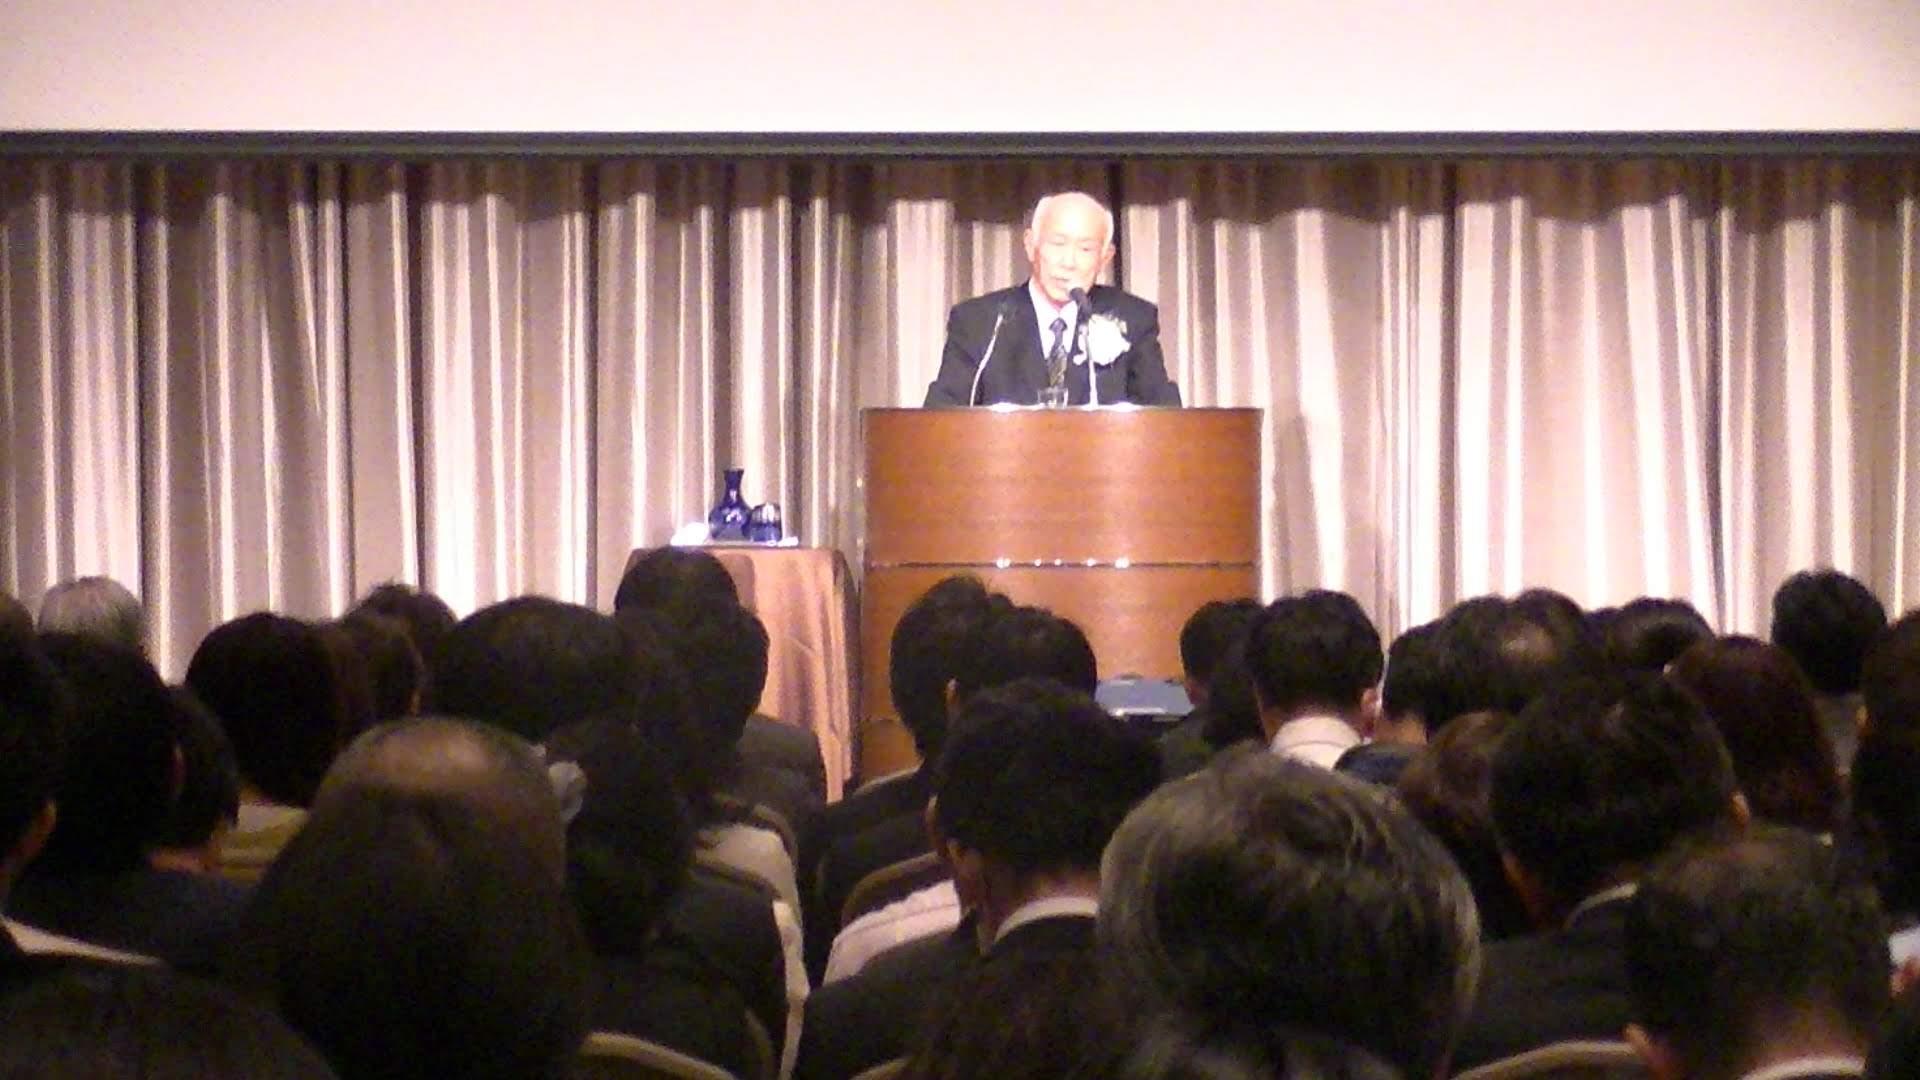 PIC 1671 1 - 思風会全国大会in広島